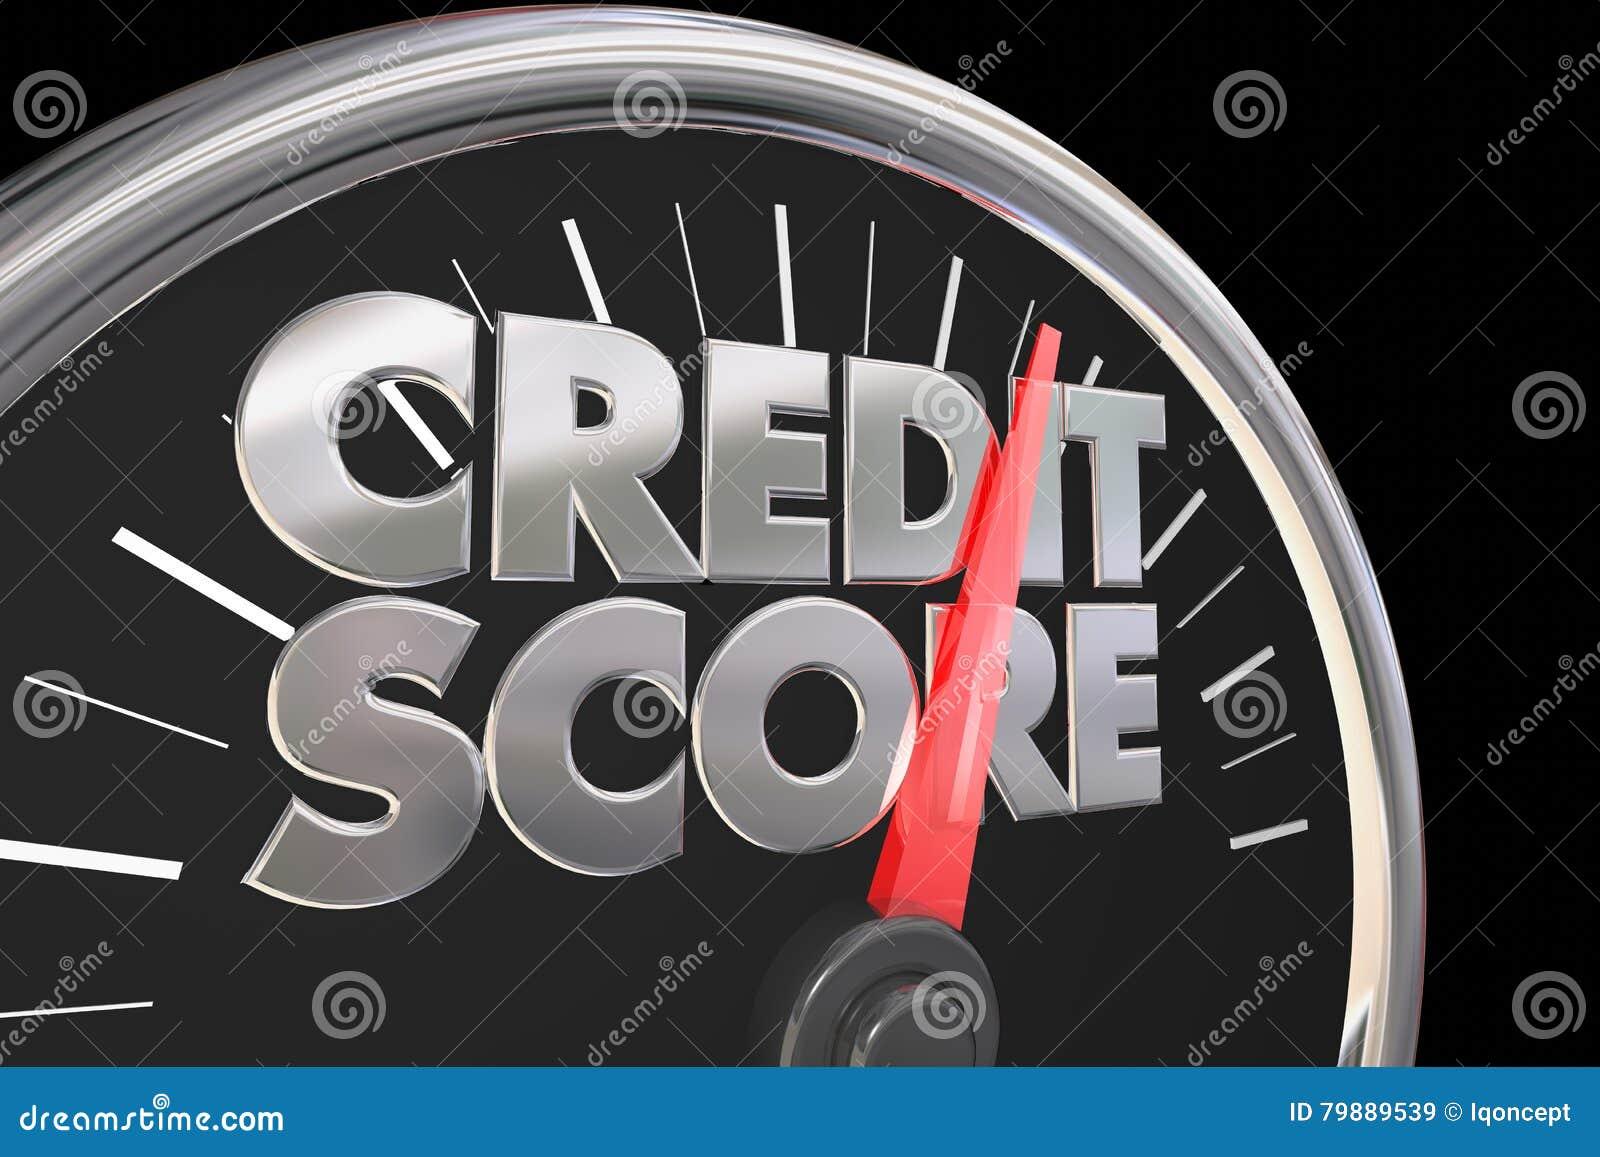 Credit Score Speedometer Better Improve Rating Number